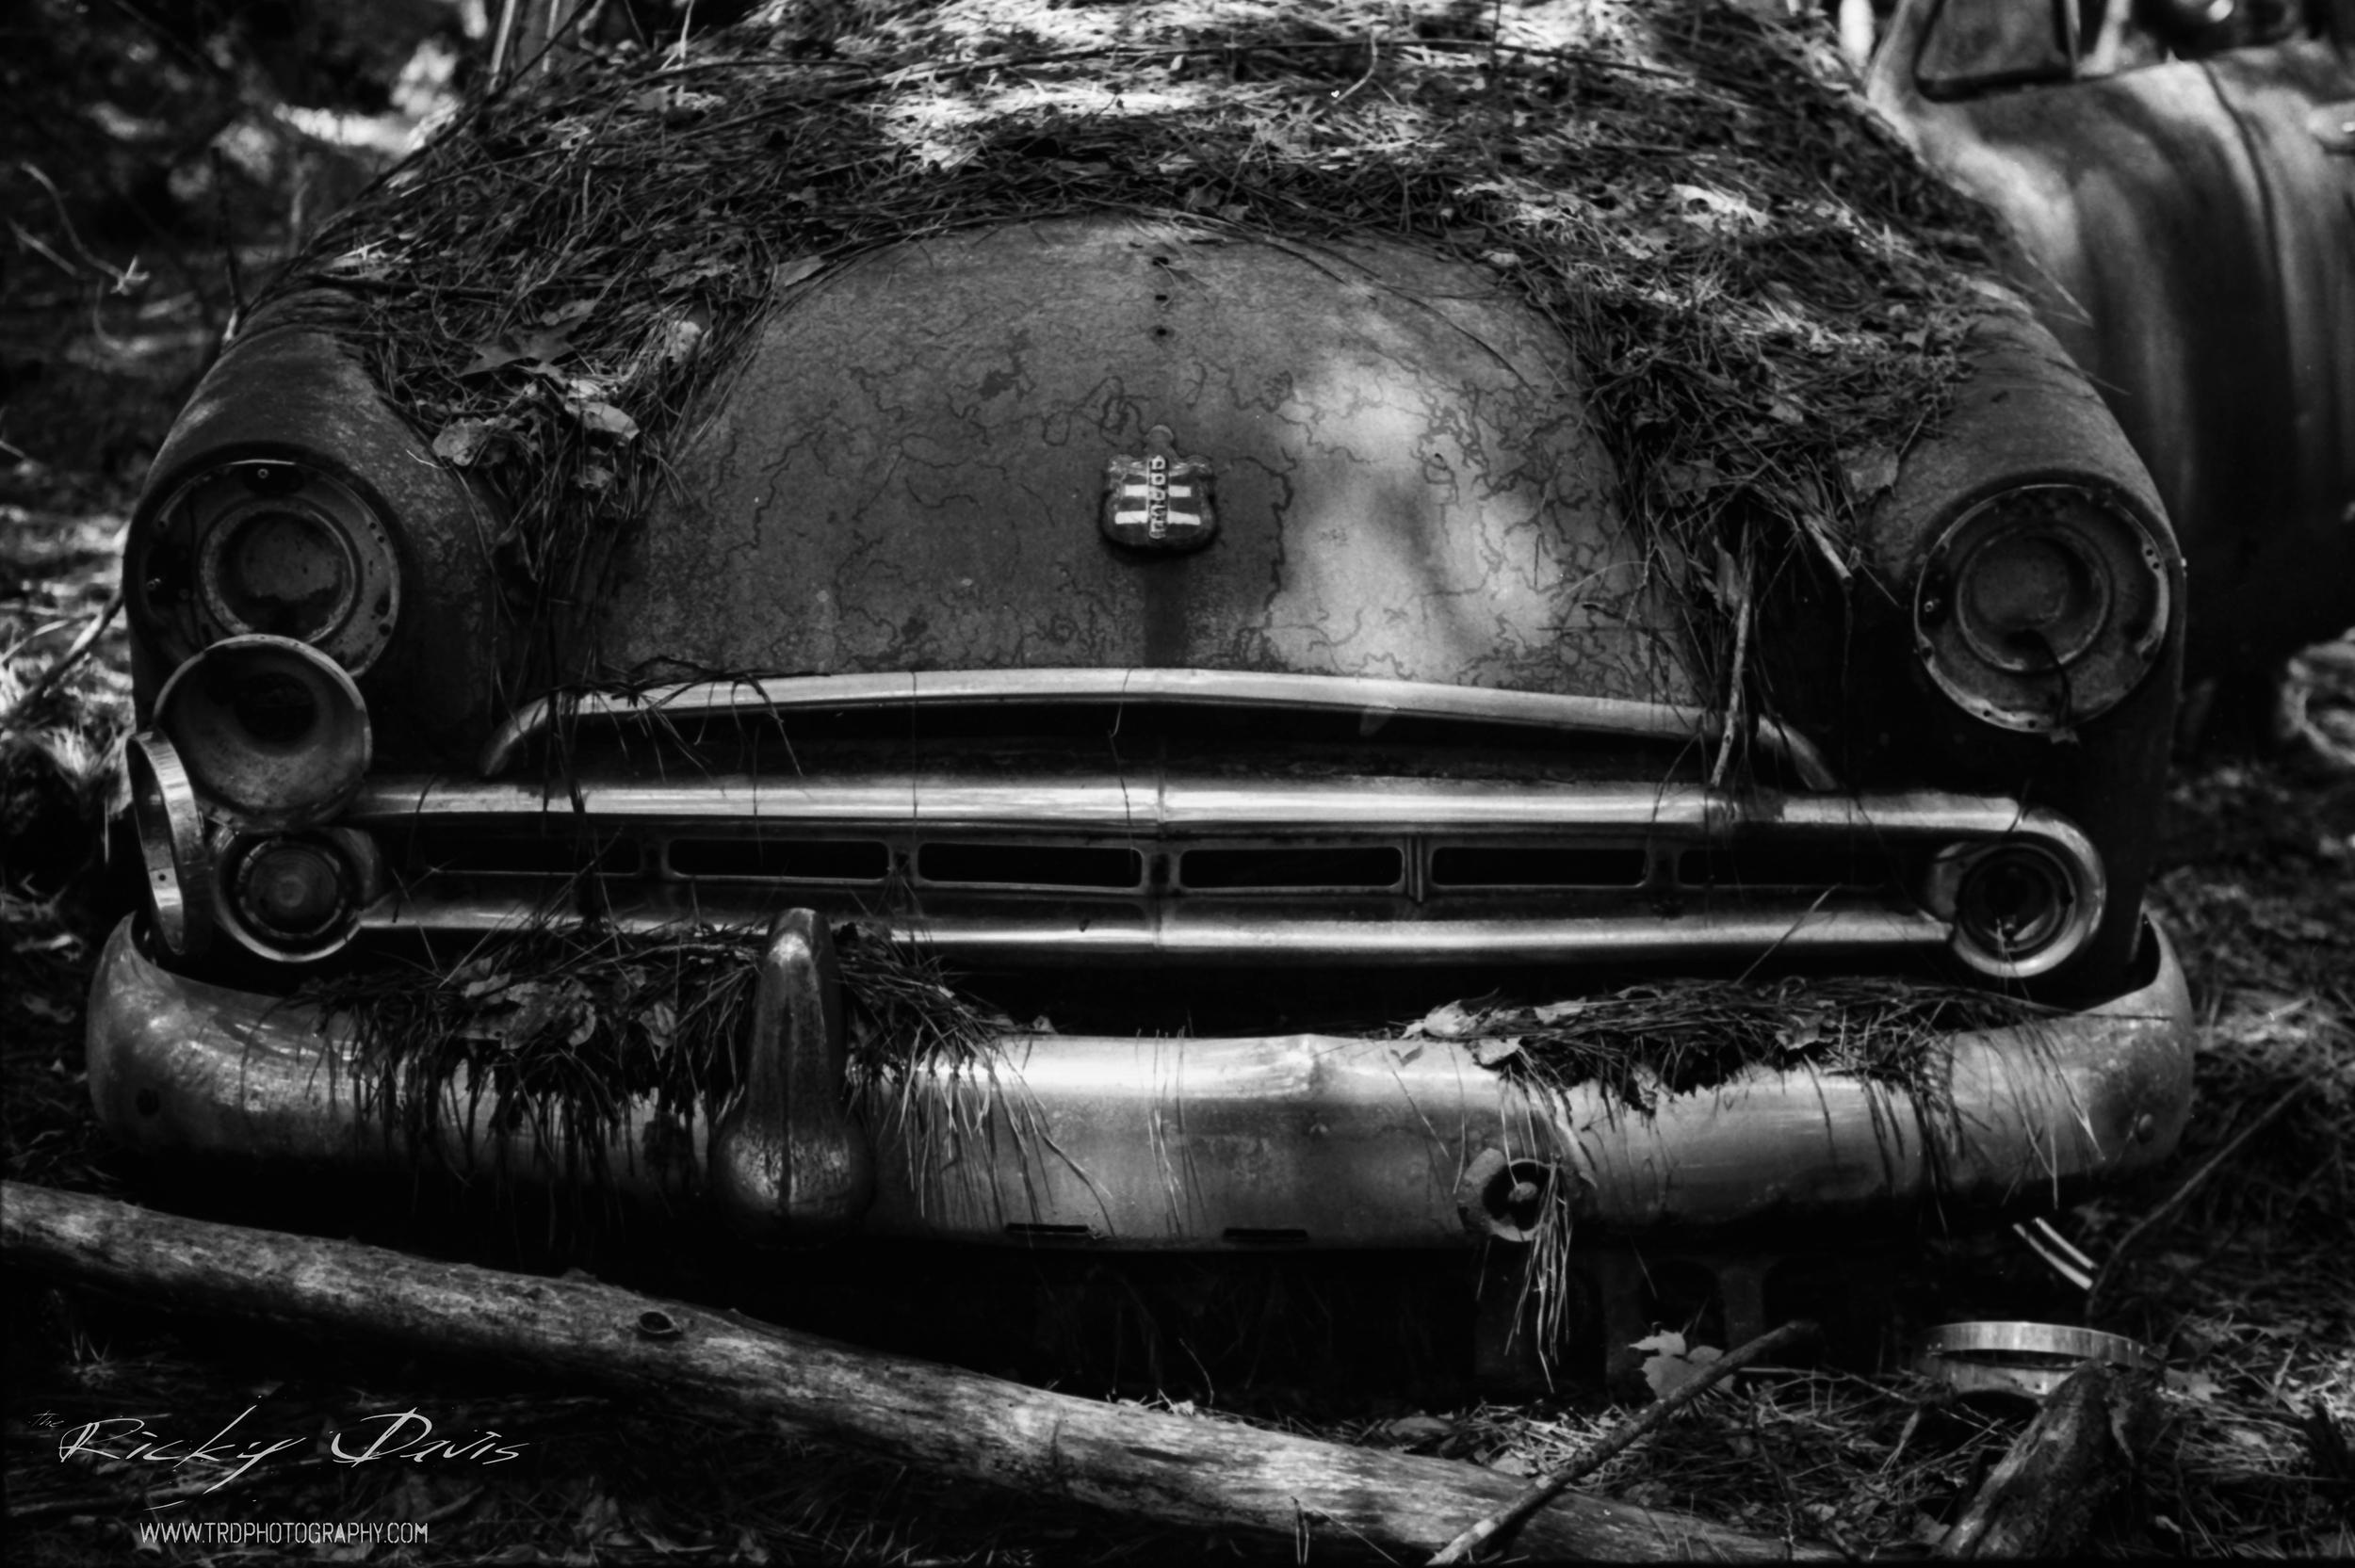 Old Car City USA - Film - Kodak Tri X - Photographer Ricky Davis of TRD Photography